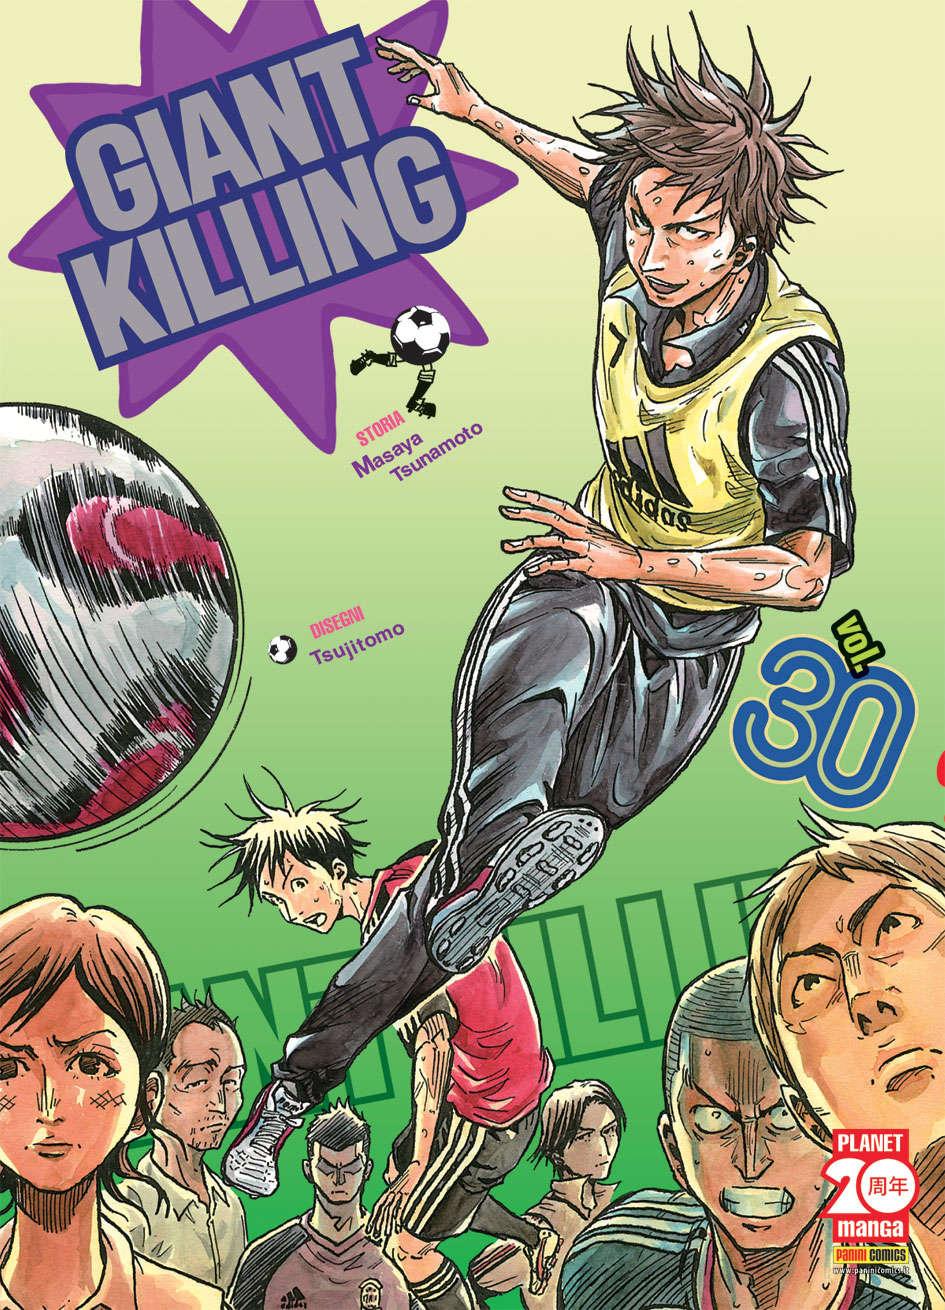 Giant Killing vol. 30